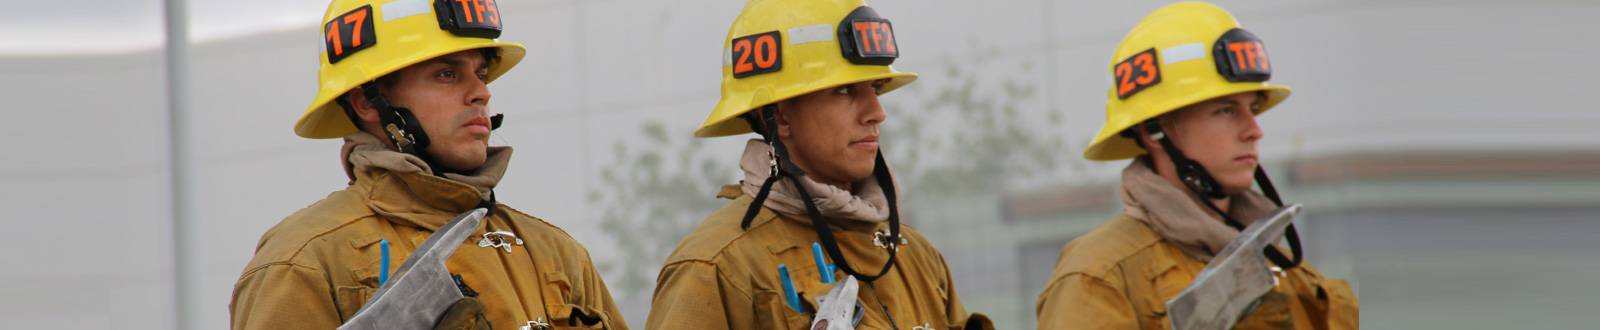 Three LAFD Firefighters